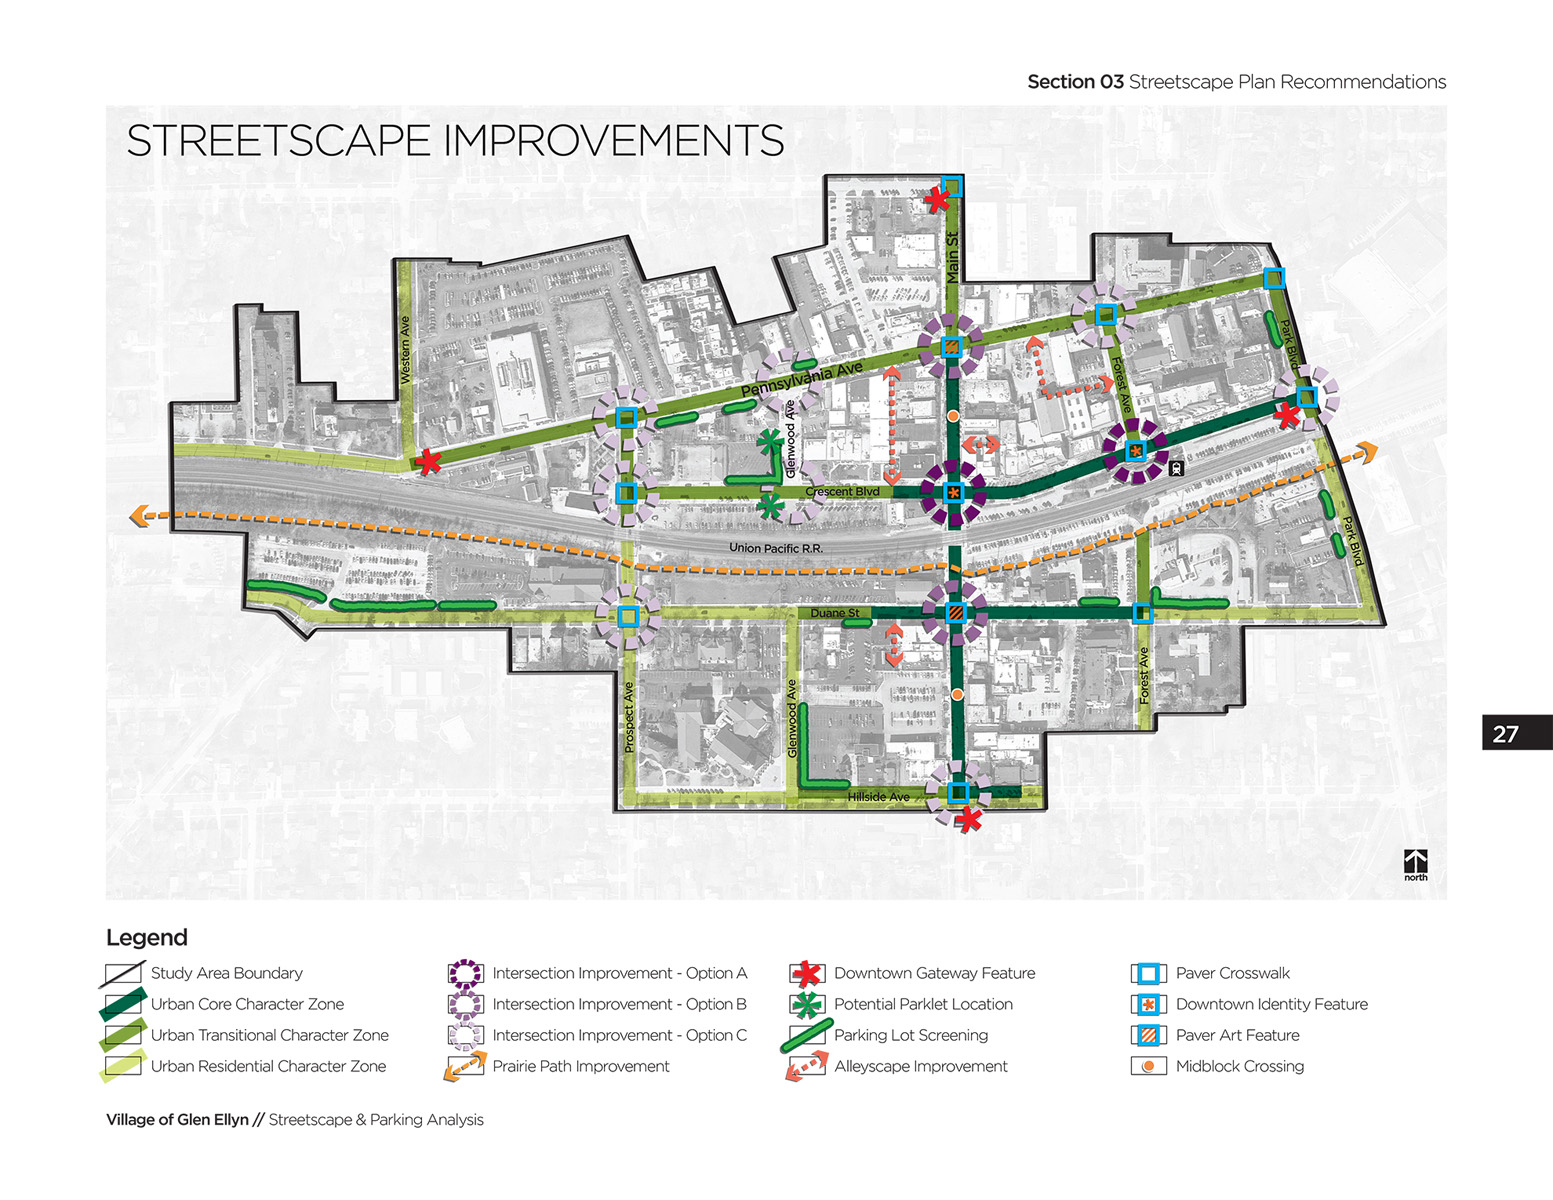 https://www.hlplanning.com/portals/wp-content/uploads/2014/10/Glen-Ellyn-Streetscape-Plan-Parking-Study-31.jpg